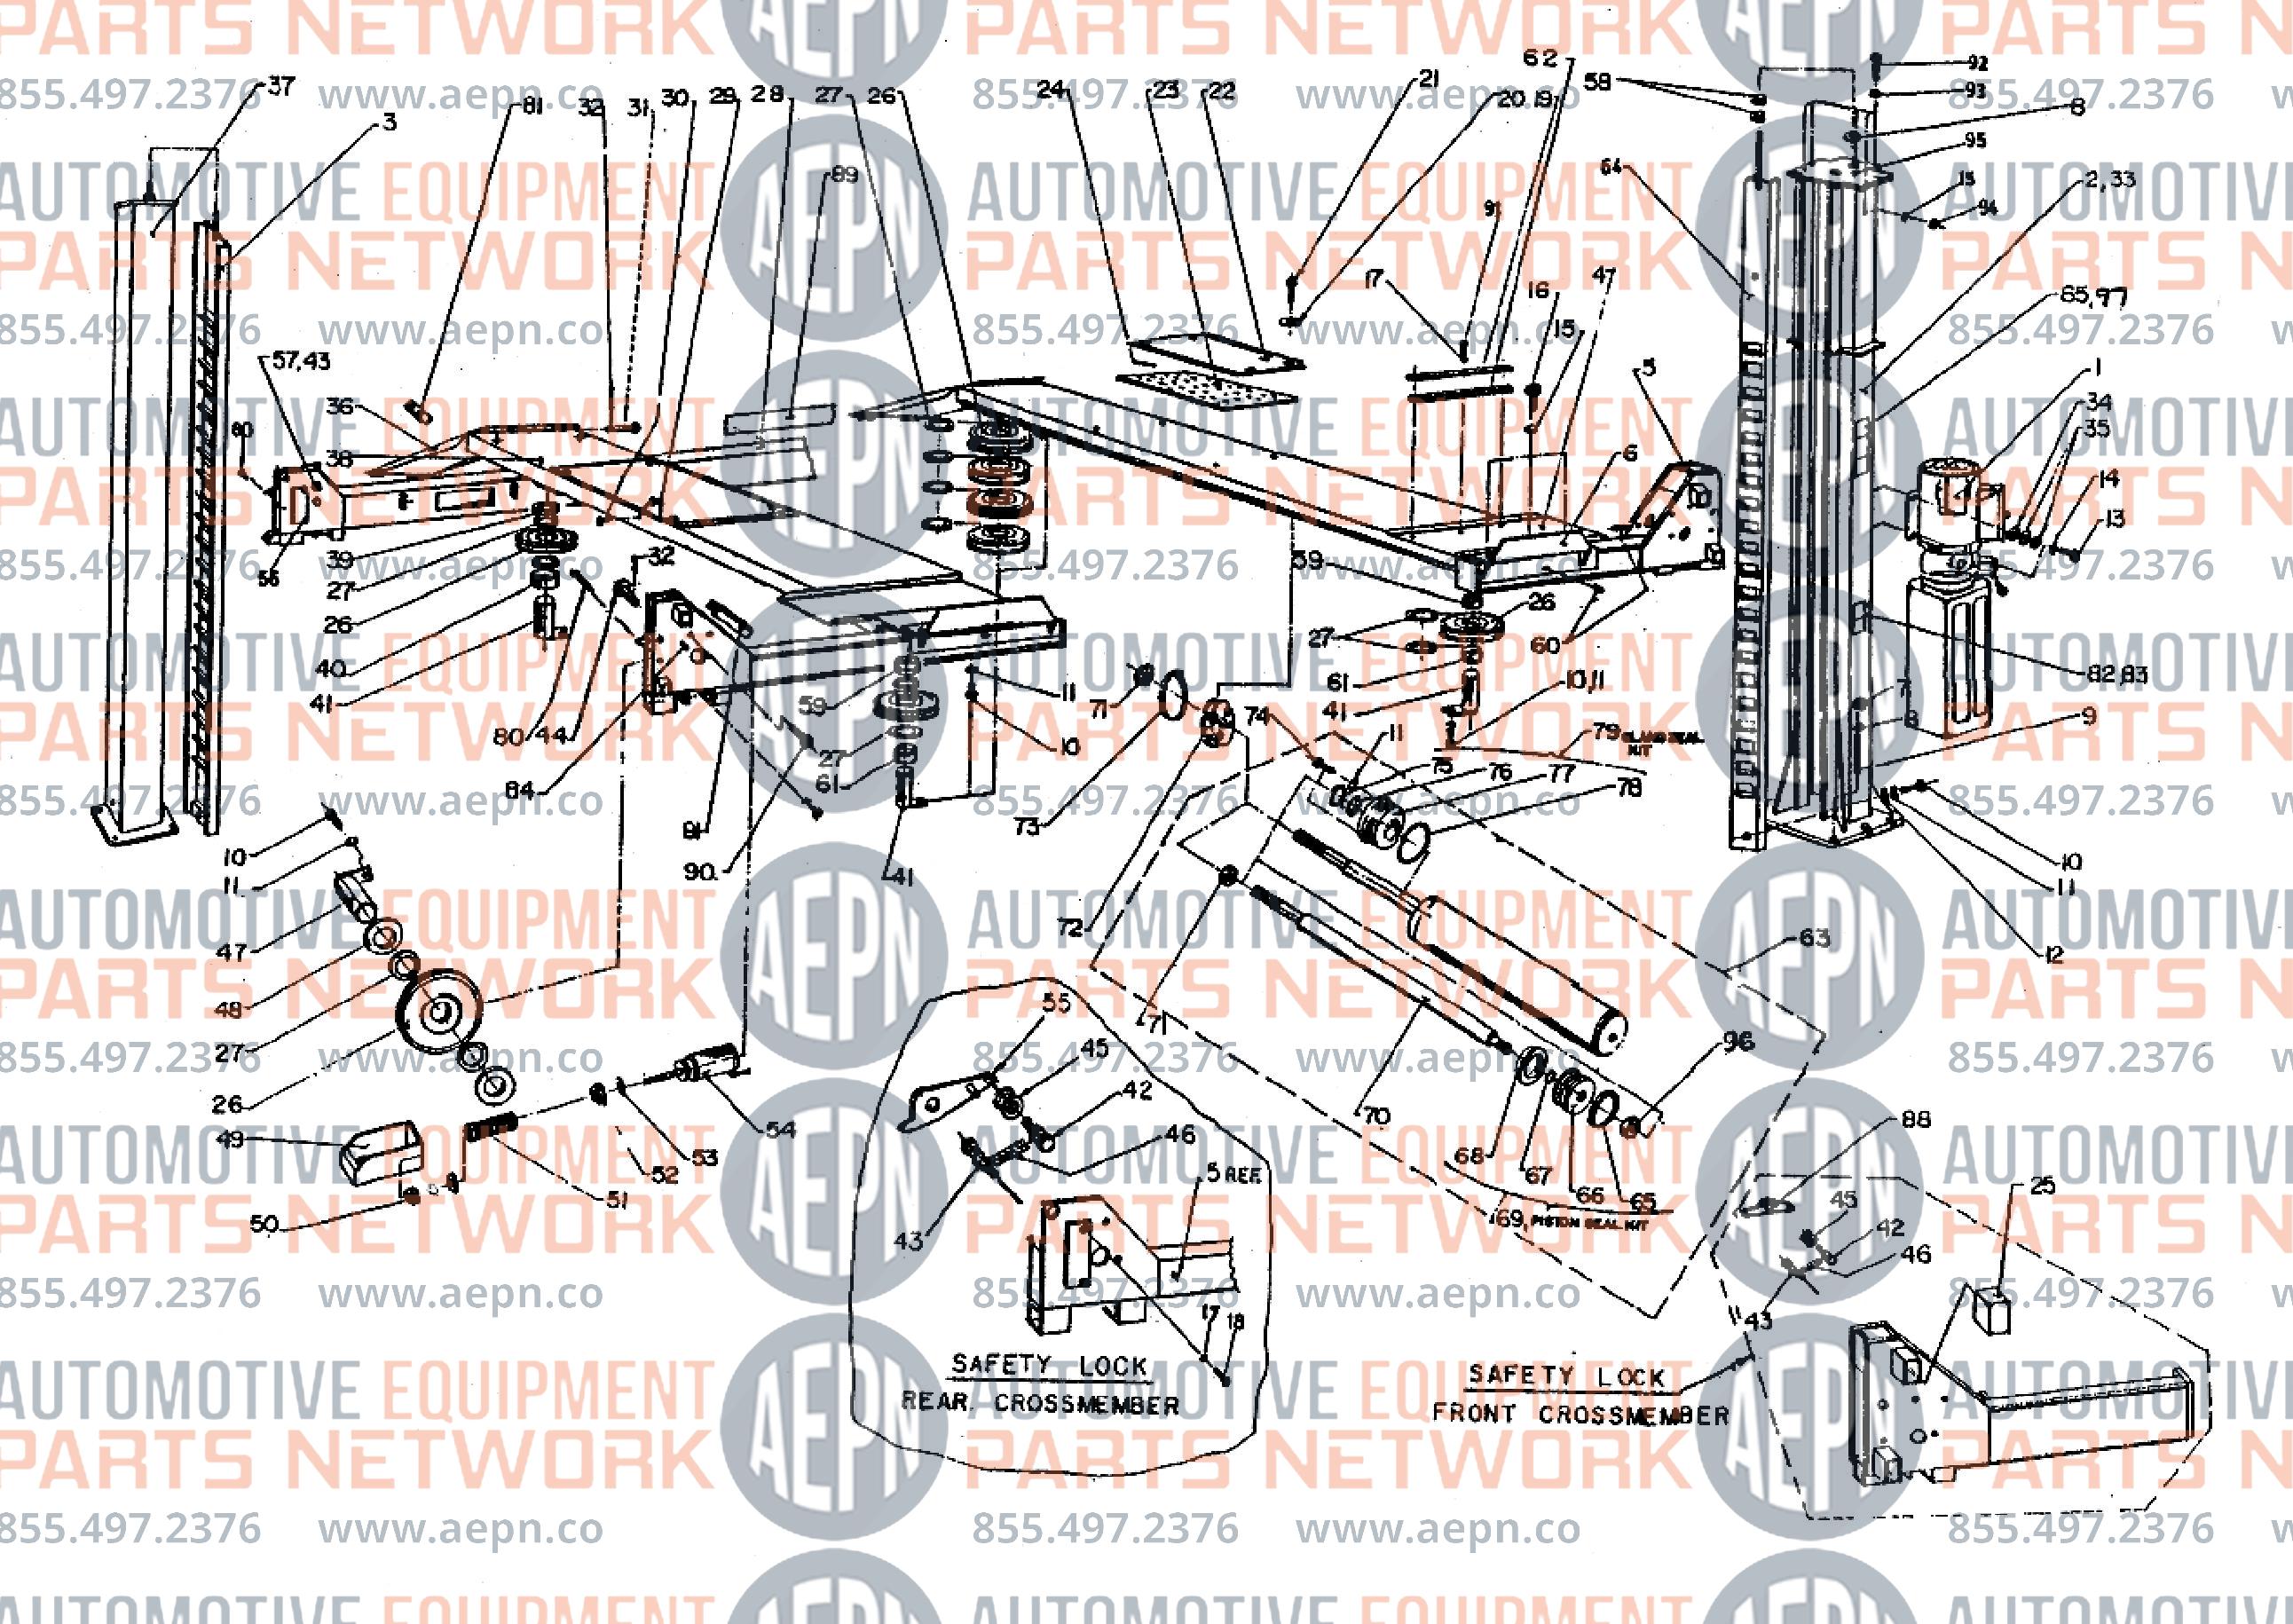 JOHN BEAN 44214Q Parts BreakdownAutomotive Equipment Parts Network